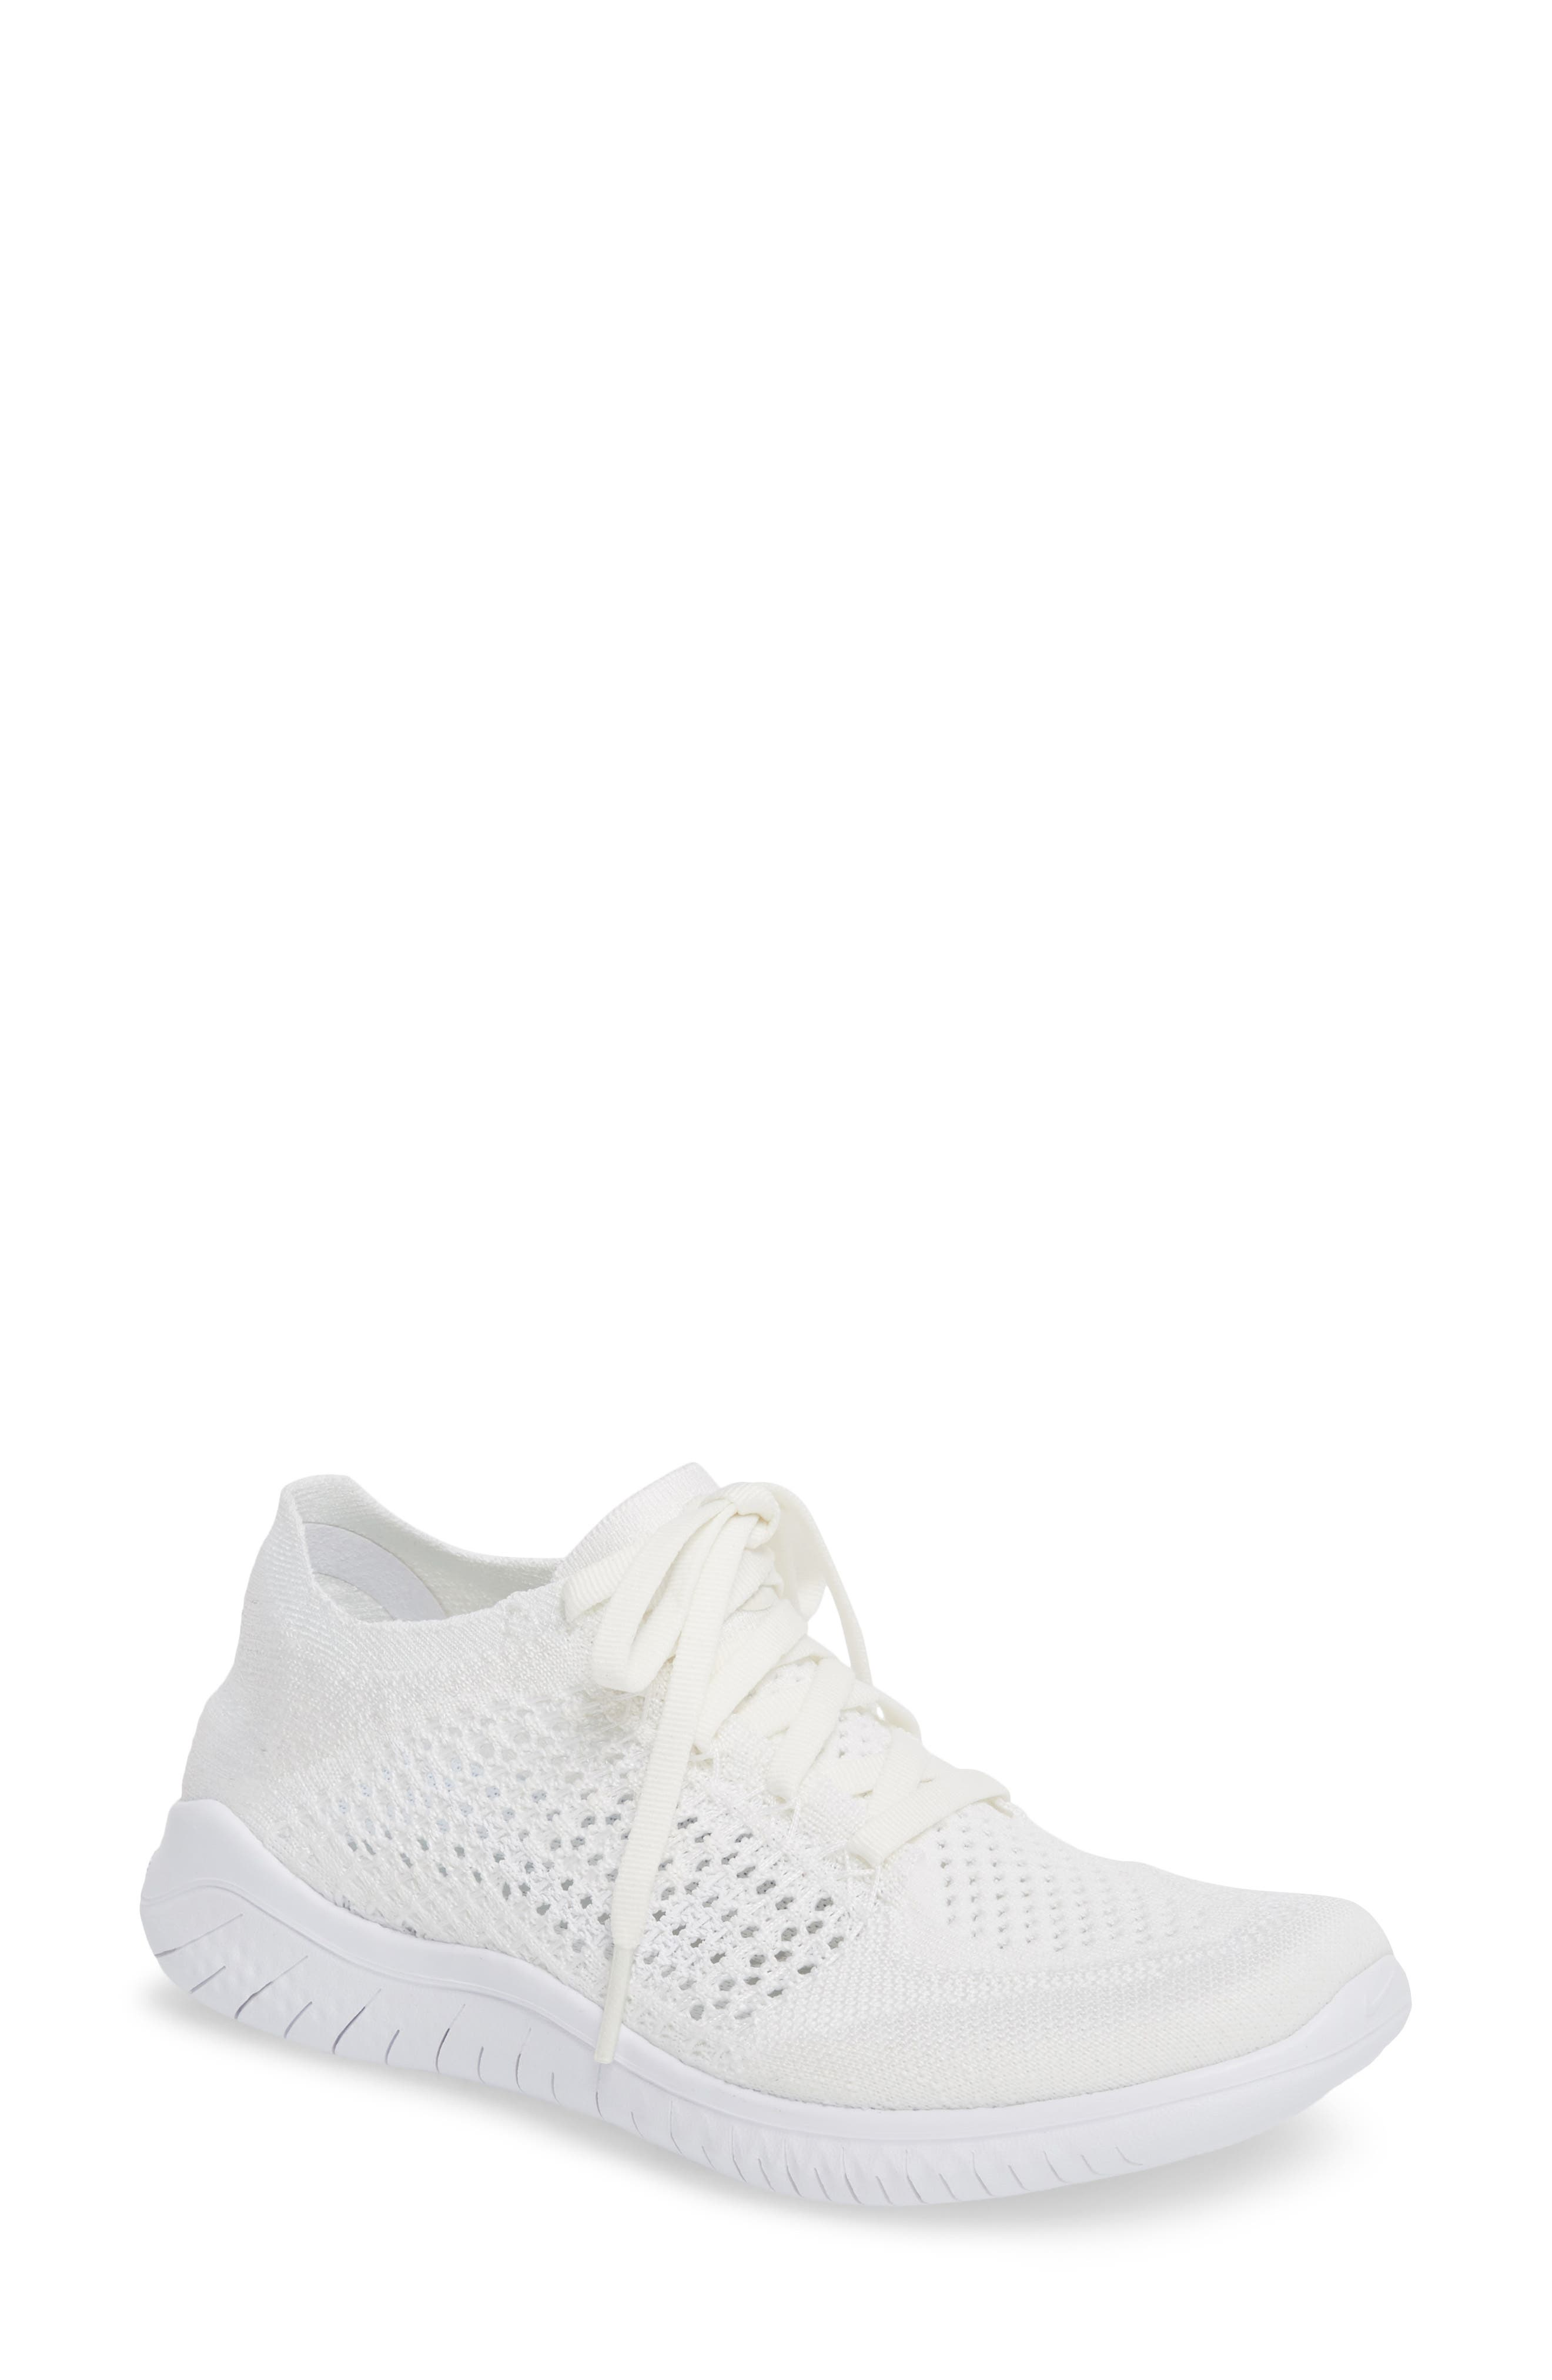 Free RN Flyknit 2018 Running Shoe,                             Main thumbnail 1, color,                             White/ White